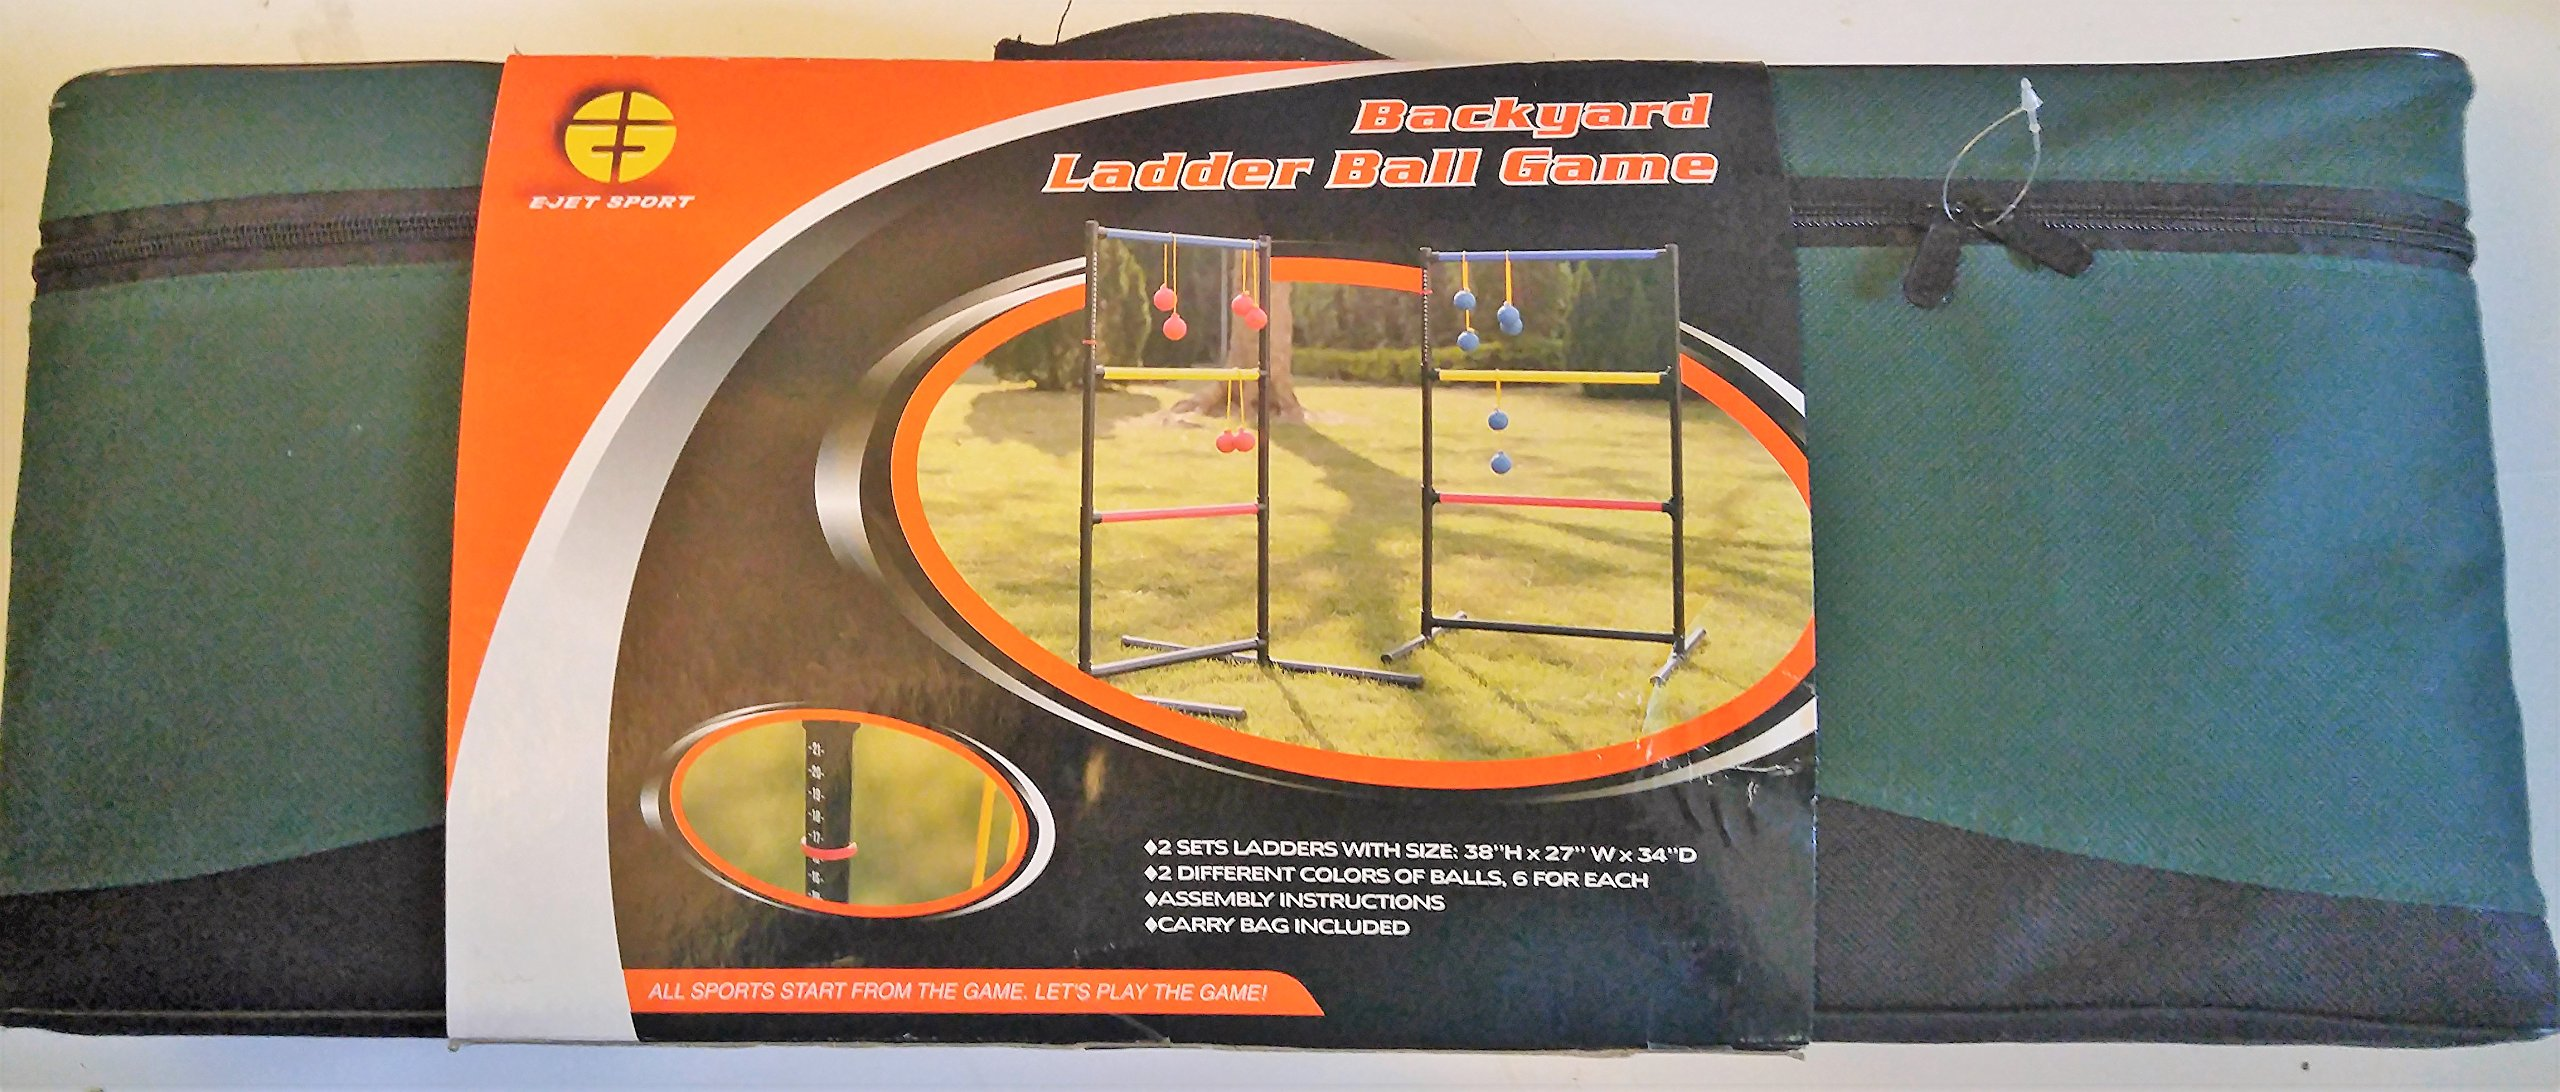 E-Jet Sports Backyard Ladder Ball Game